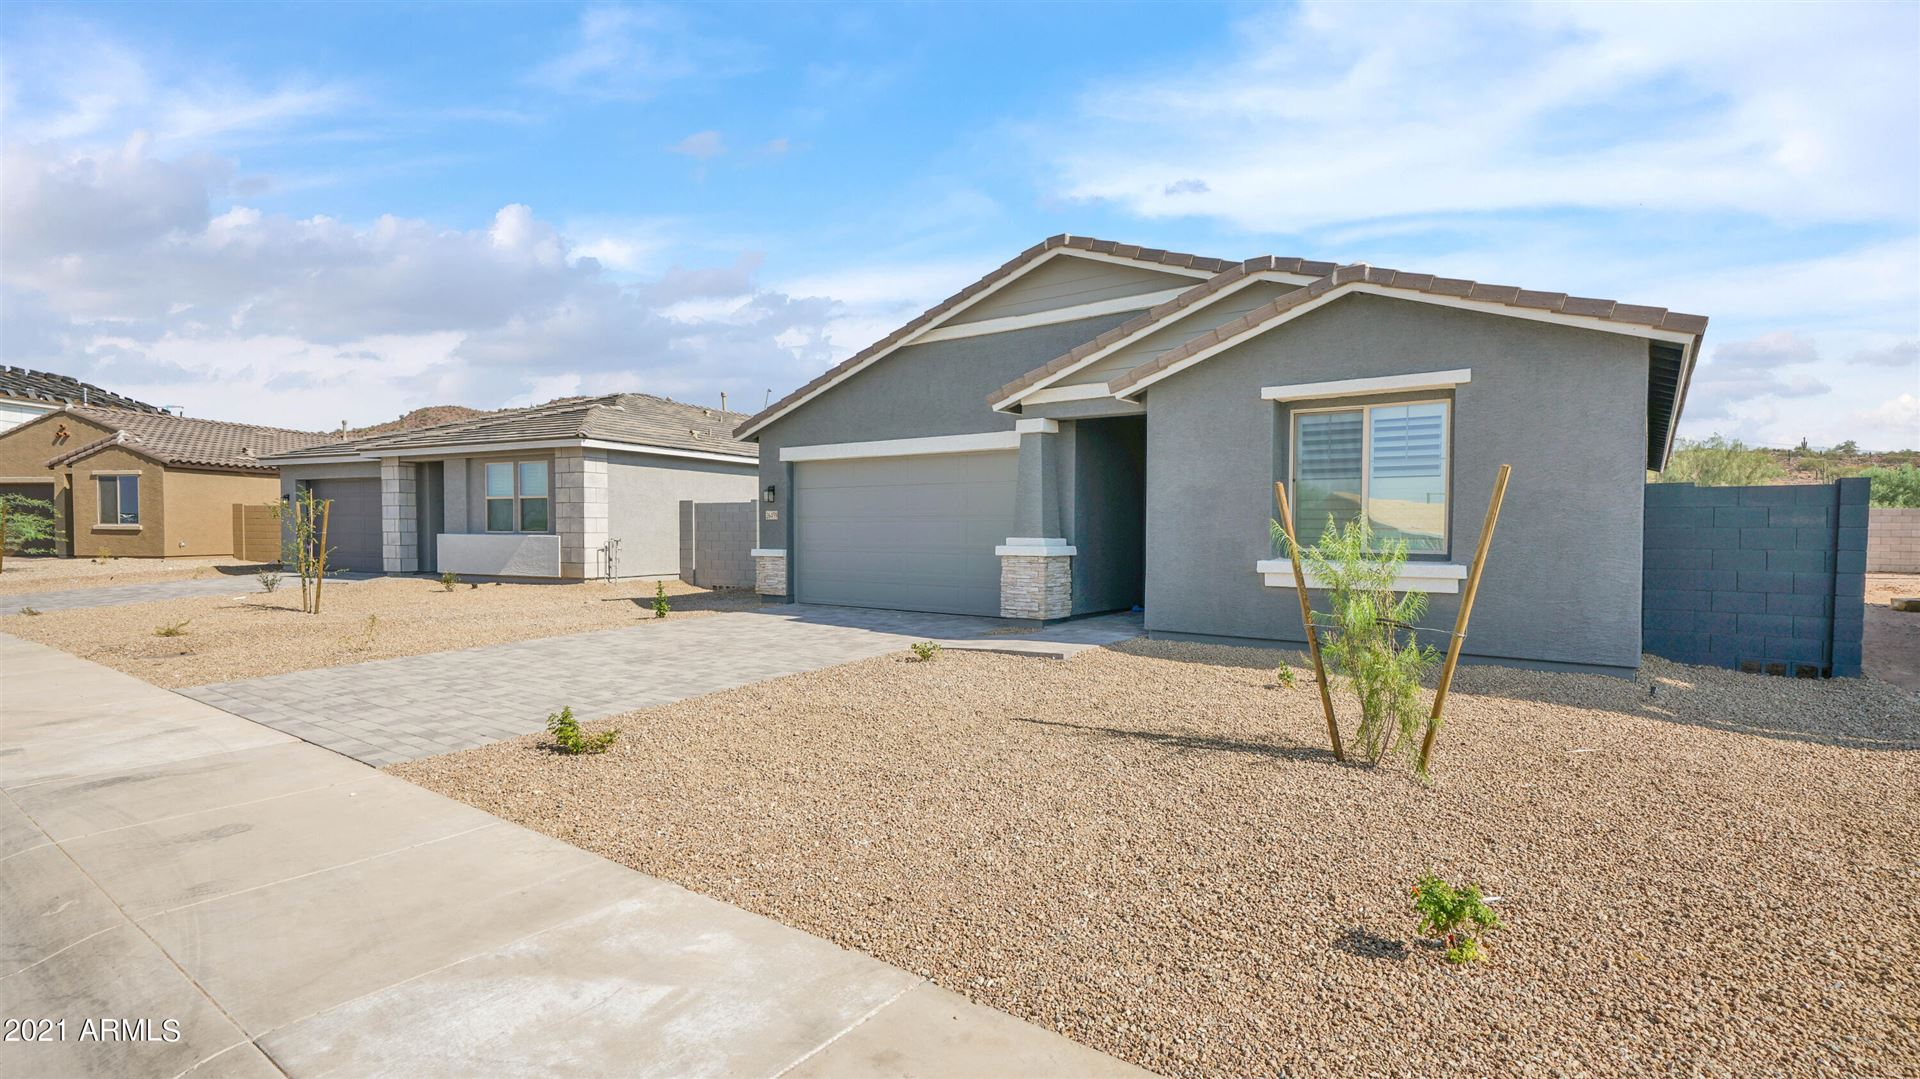 Photo of 26459 N 133RD Avenue, Peoria, AZ 85383 (MLS # 6295767)